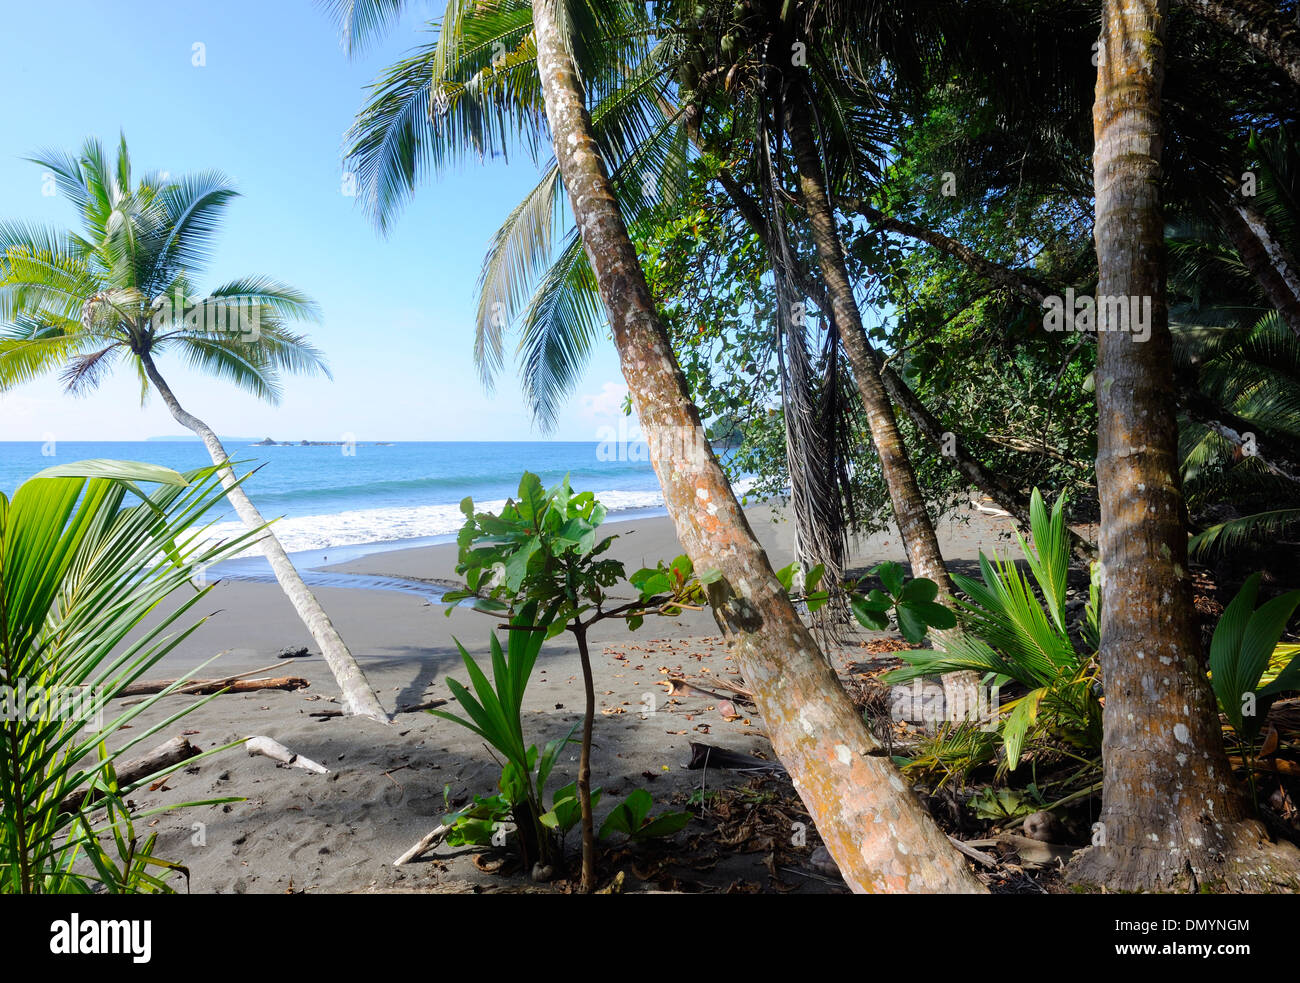 A coconut palms (Cocos nucifera) grow on an idylic sandy beach. Drake Bay, Corcovado National Park, Golfito, Costa - Stock Image